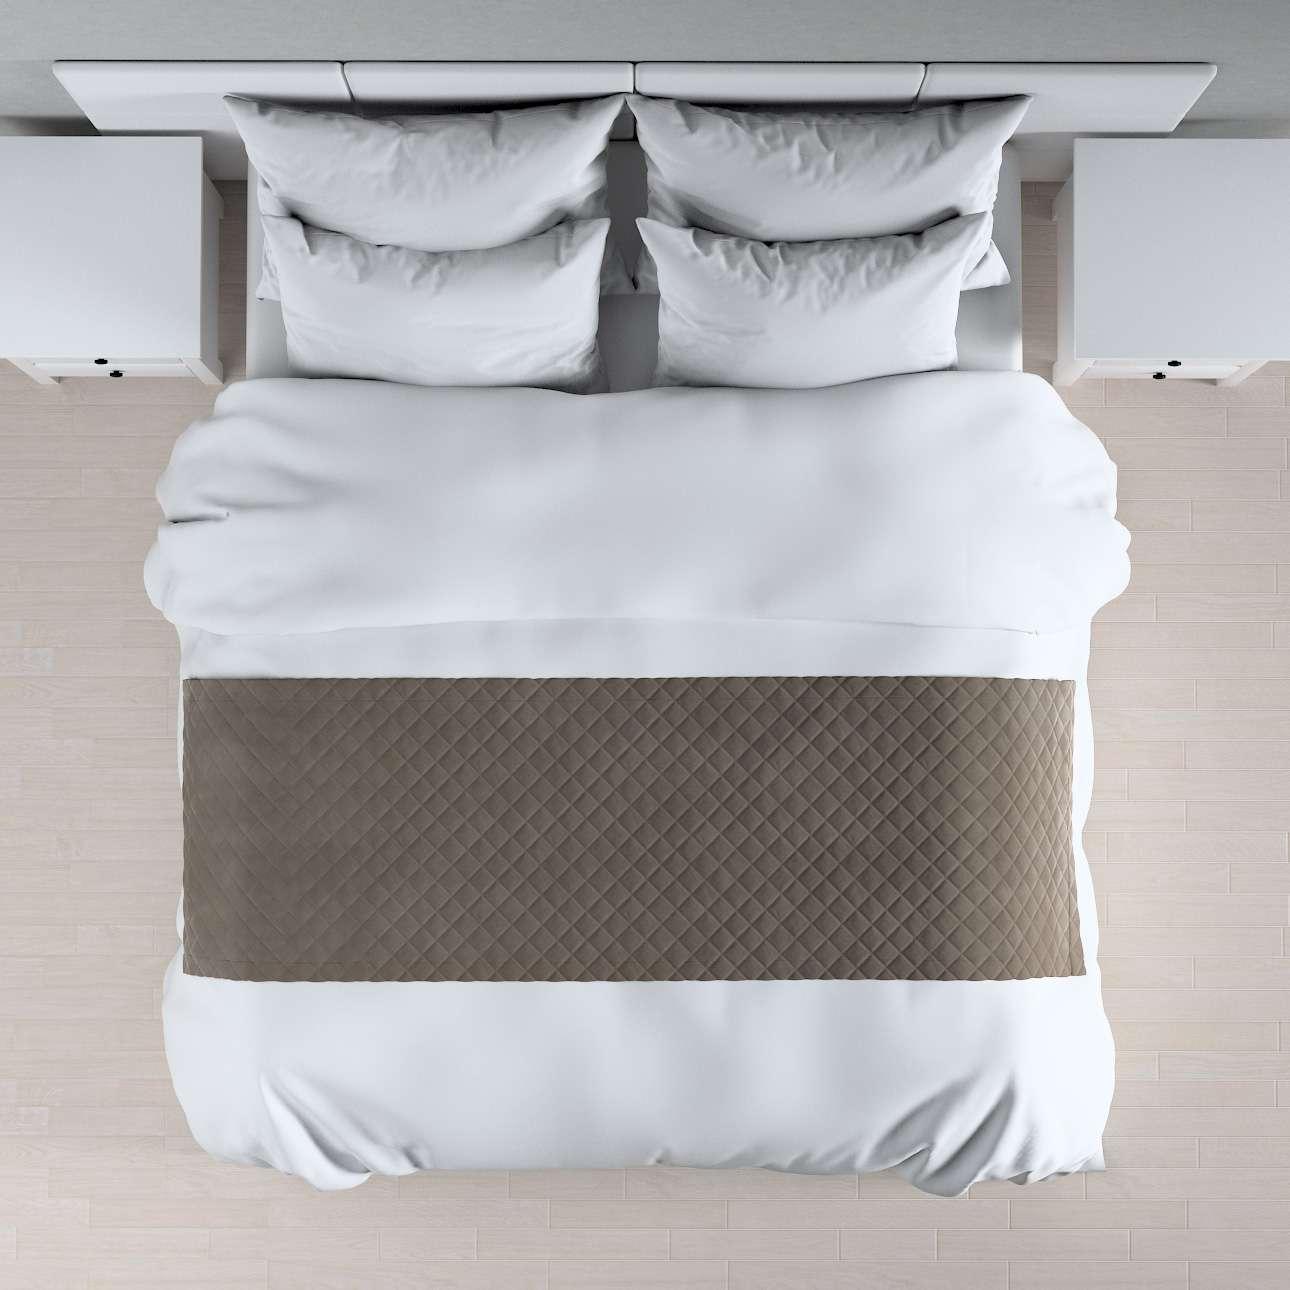 Narzuta hotelowa bieżnik Velvet 60x200cm w kolekcji Velvet, tkanina: 704-19